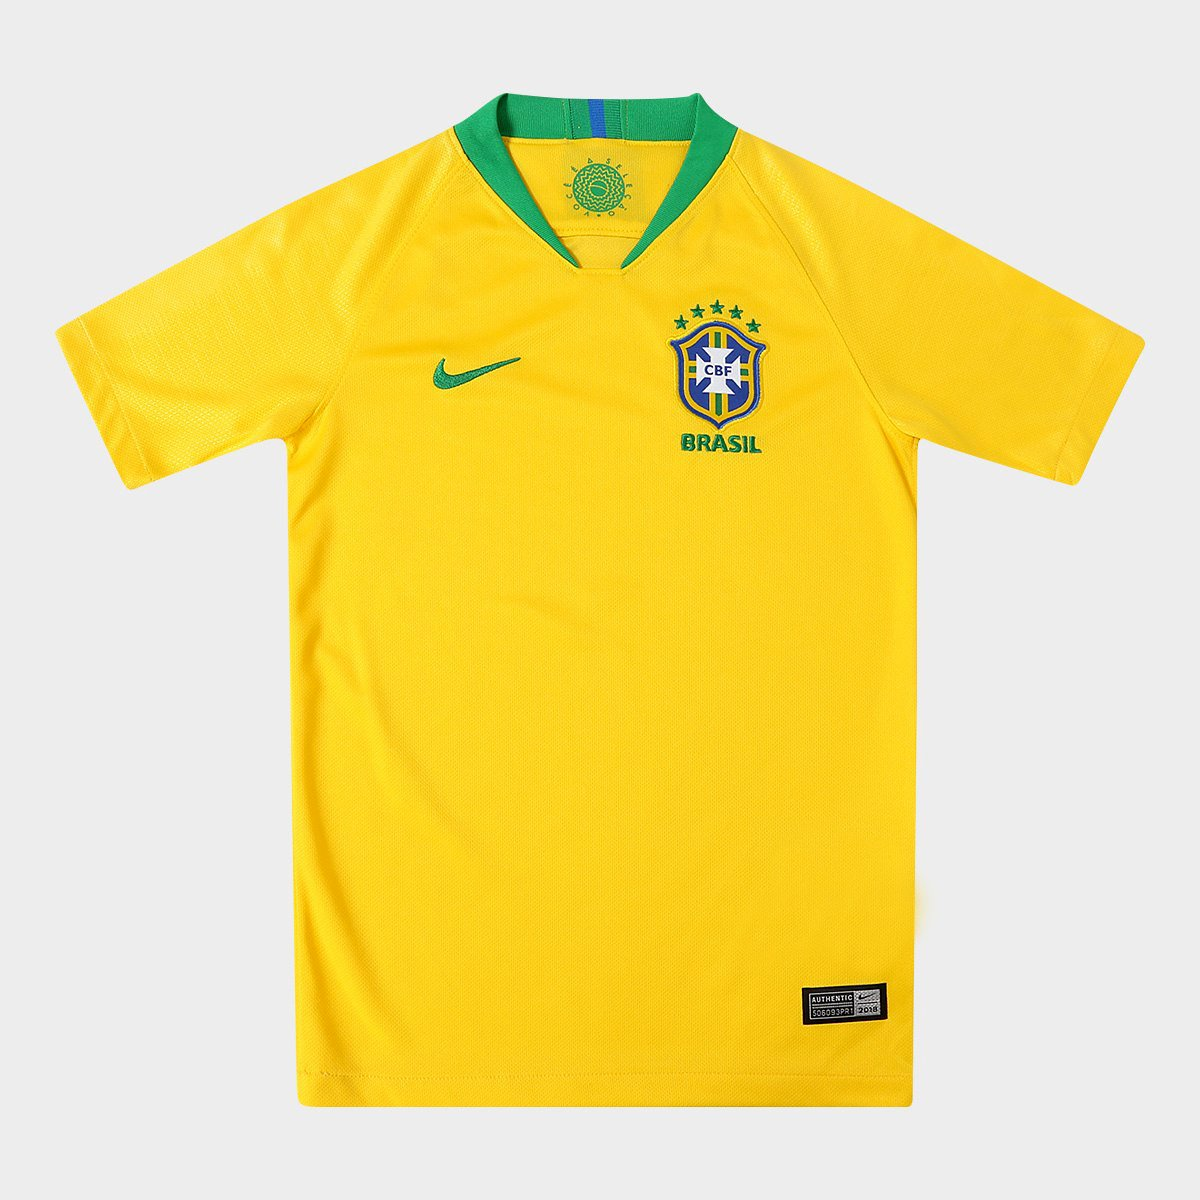 f827a2cd64 Camisa Seleção Brasil Juvenil I 2018 s n° - Torcedor Nike - Amarelo ...